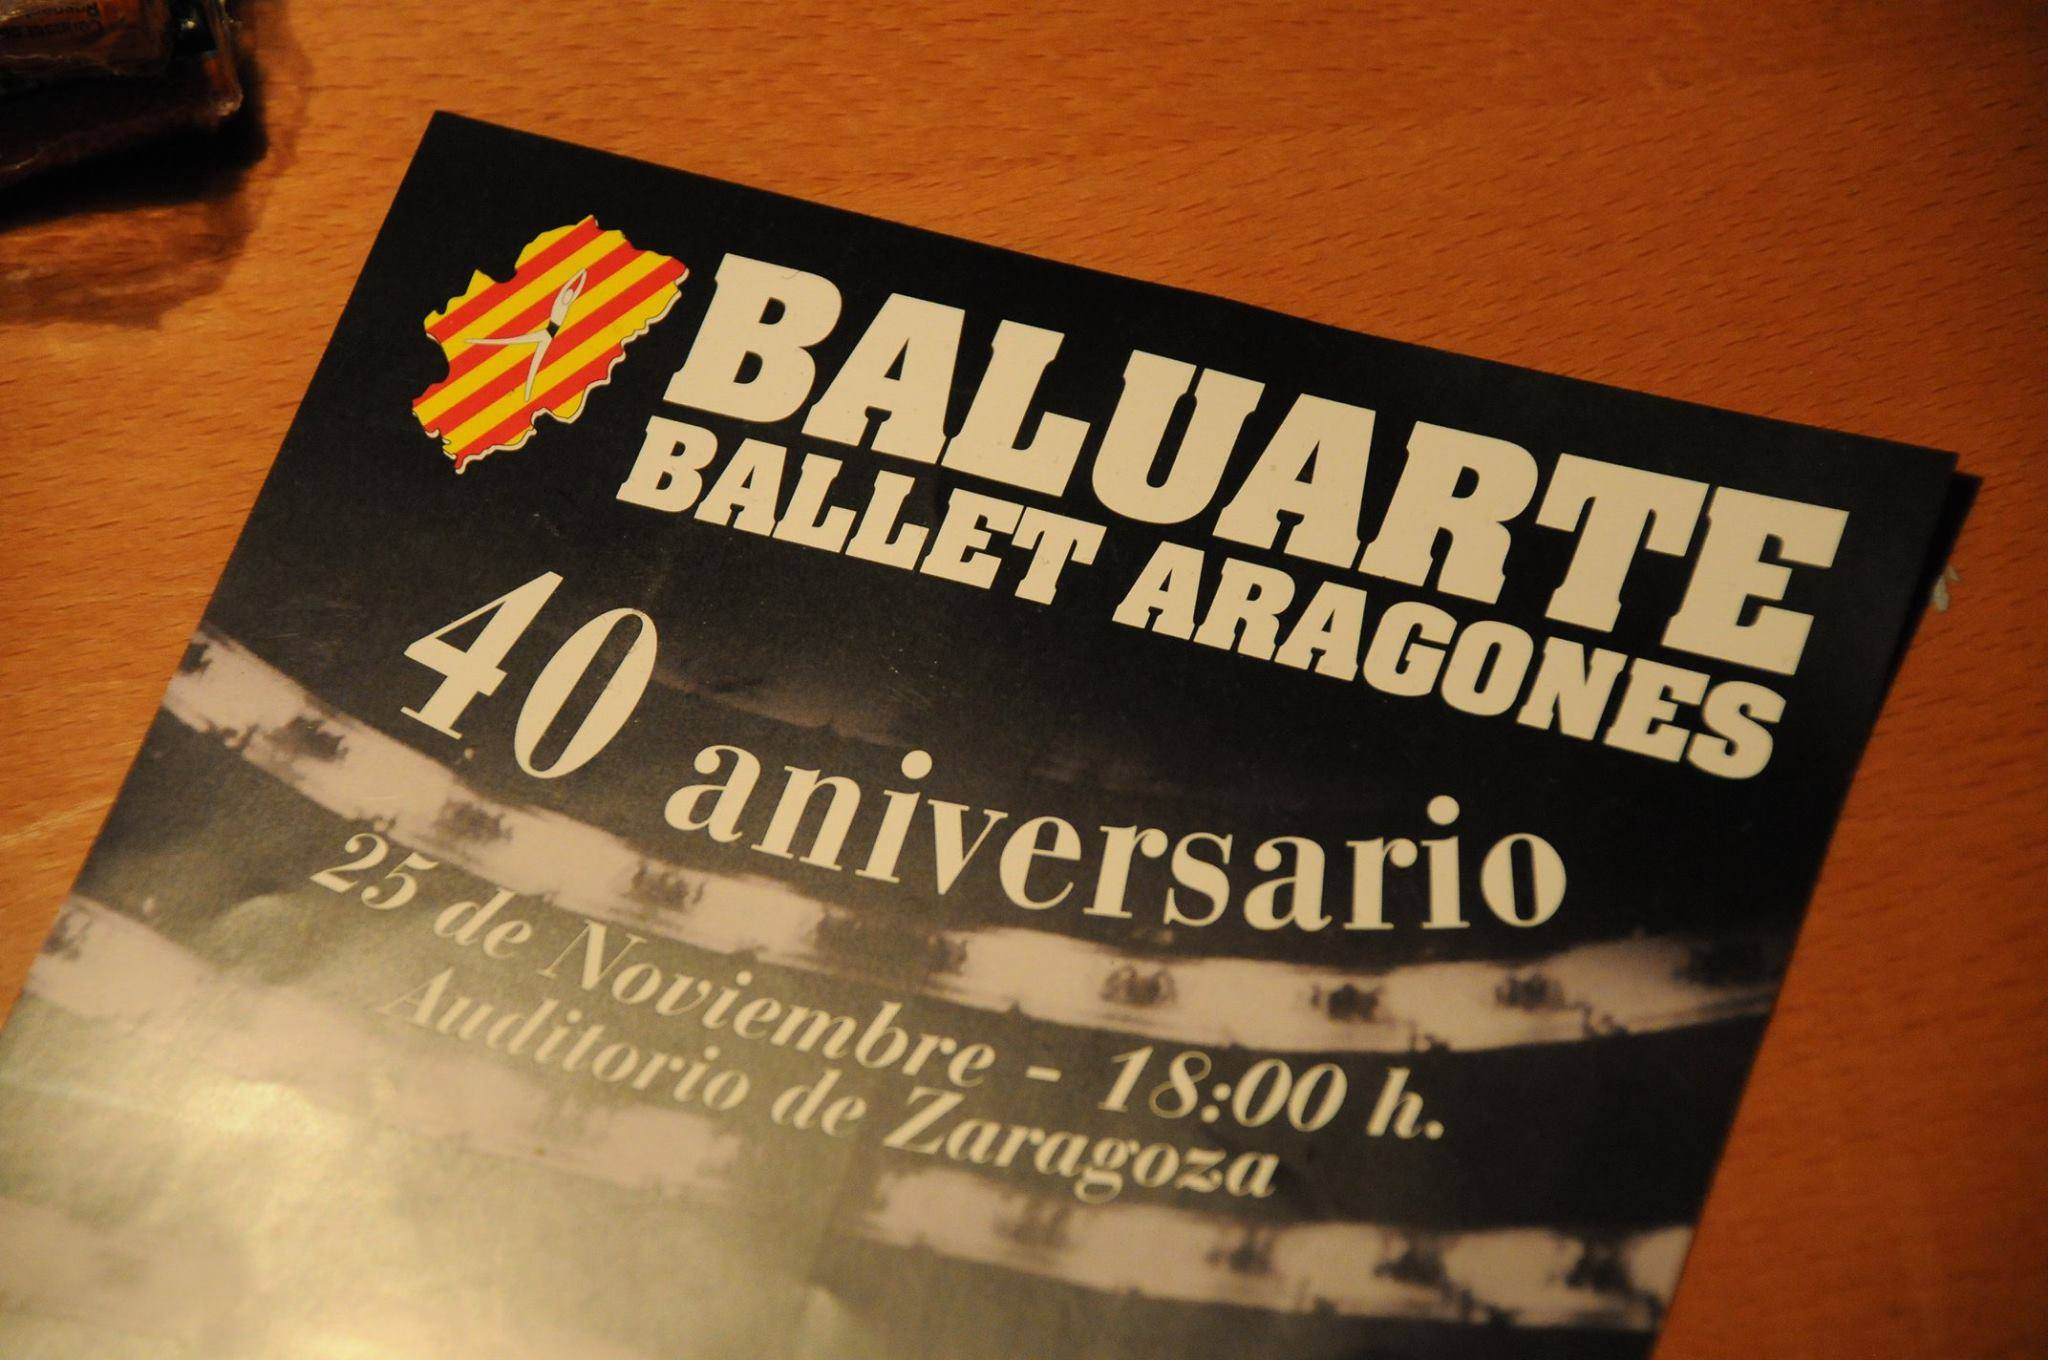 Portfolio Rampa Huesca 40 Aniversario Baluarte Aragonés 2017